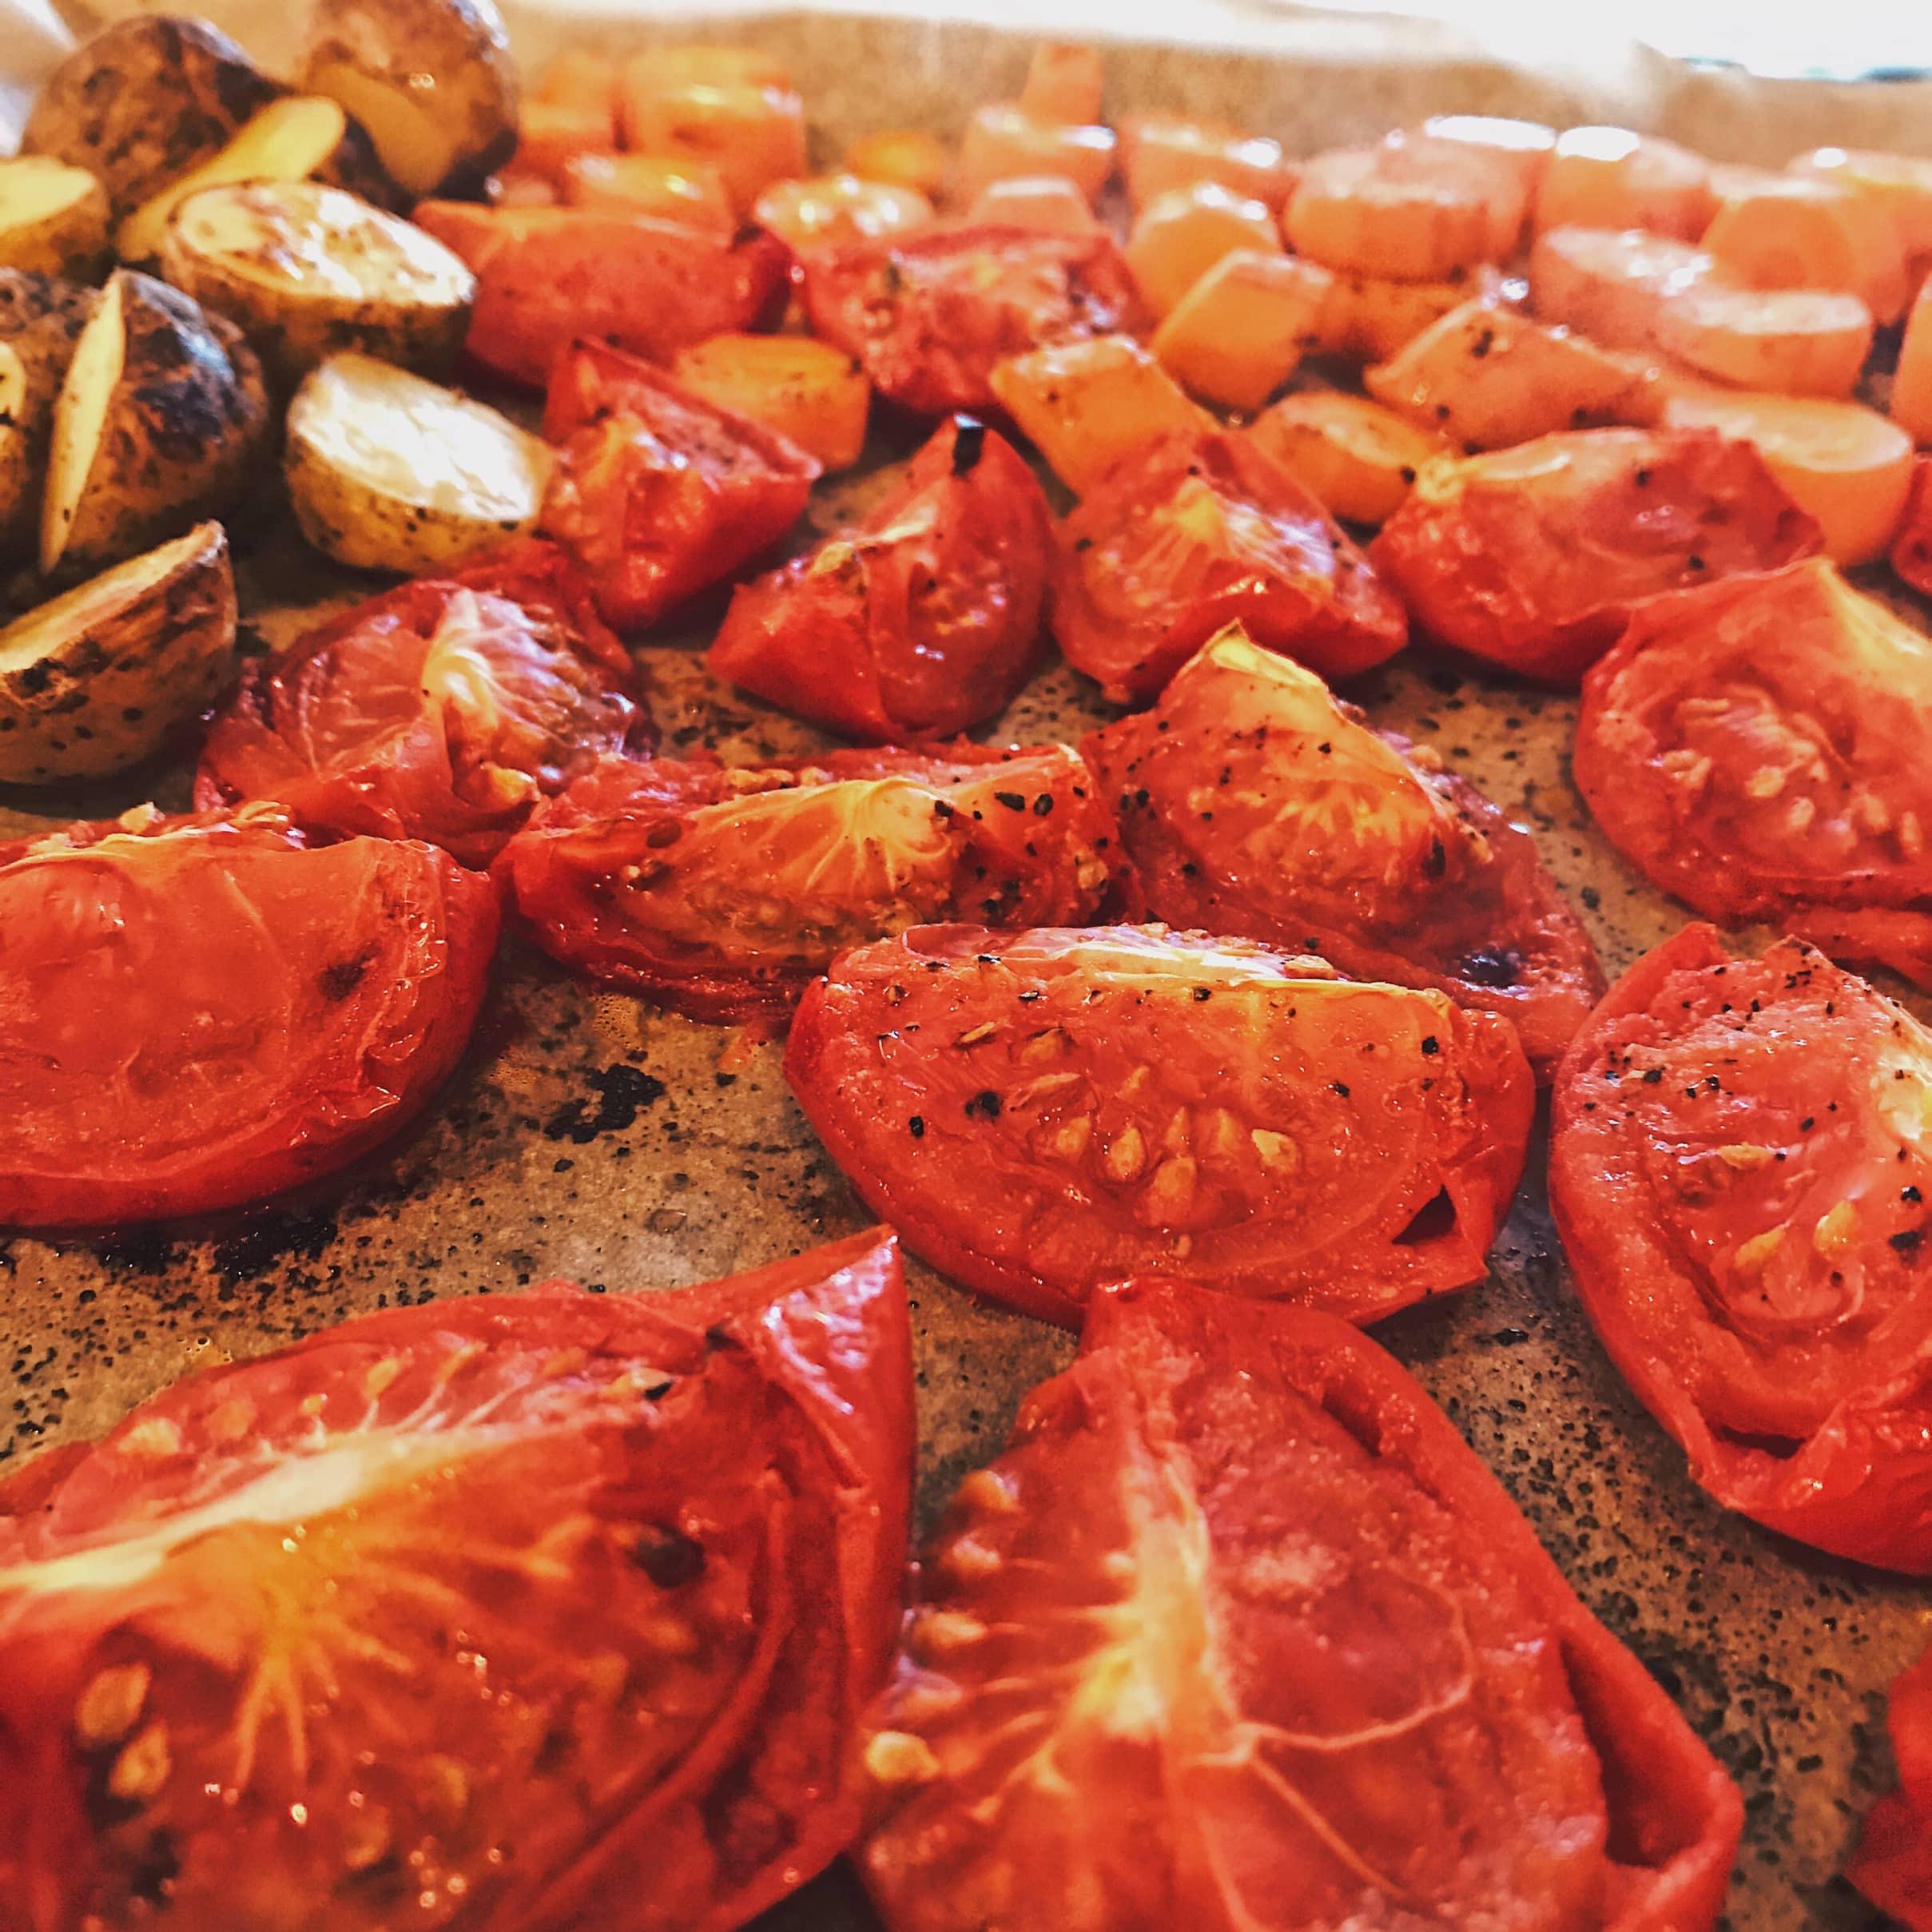 FODMAP resepti tomaattikeitto